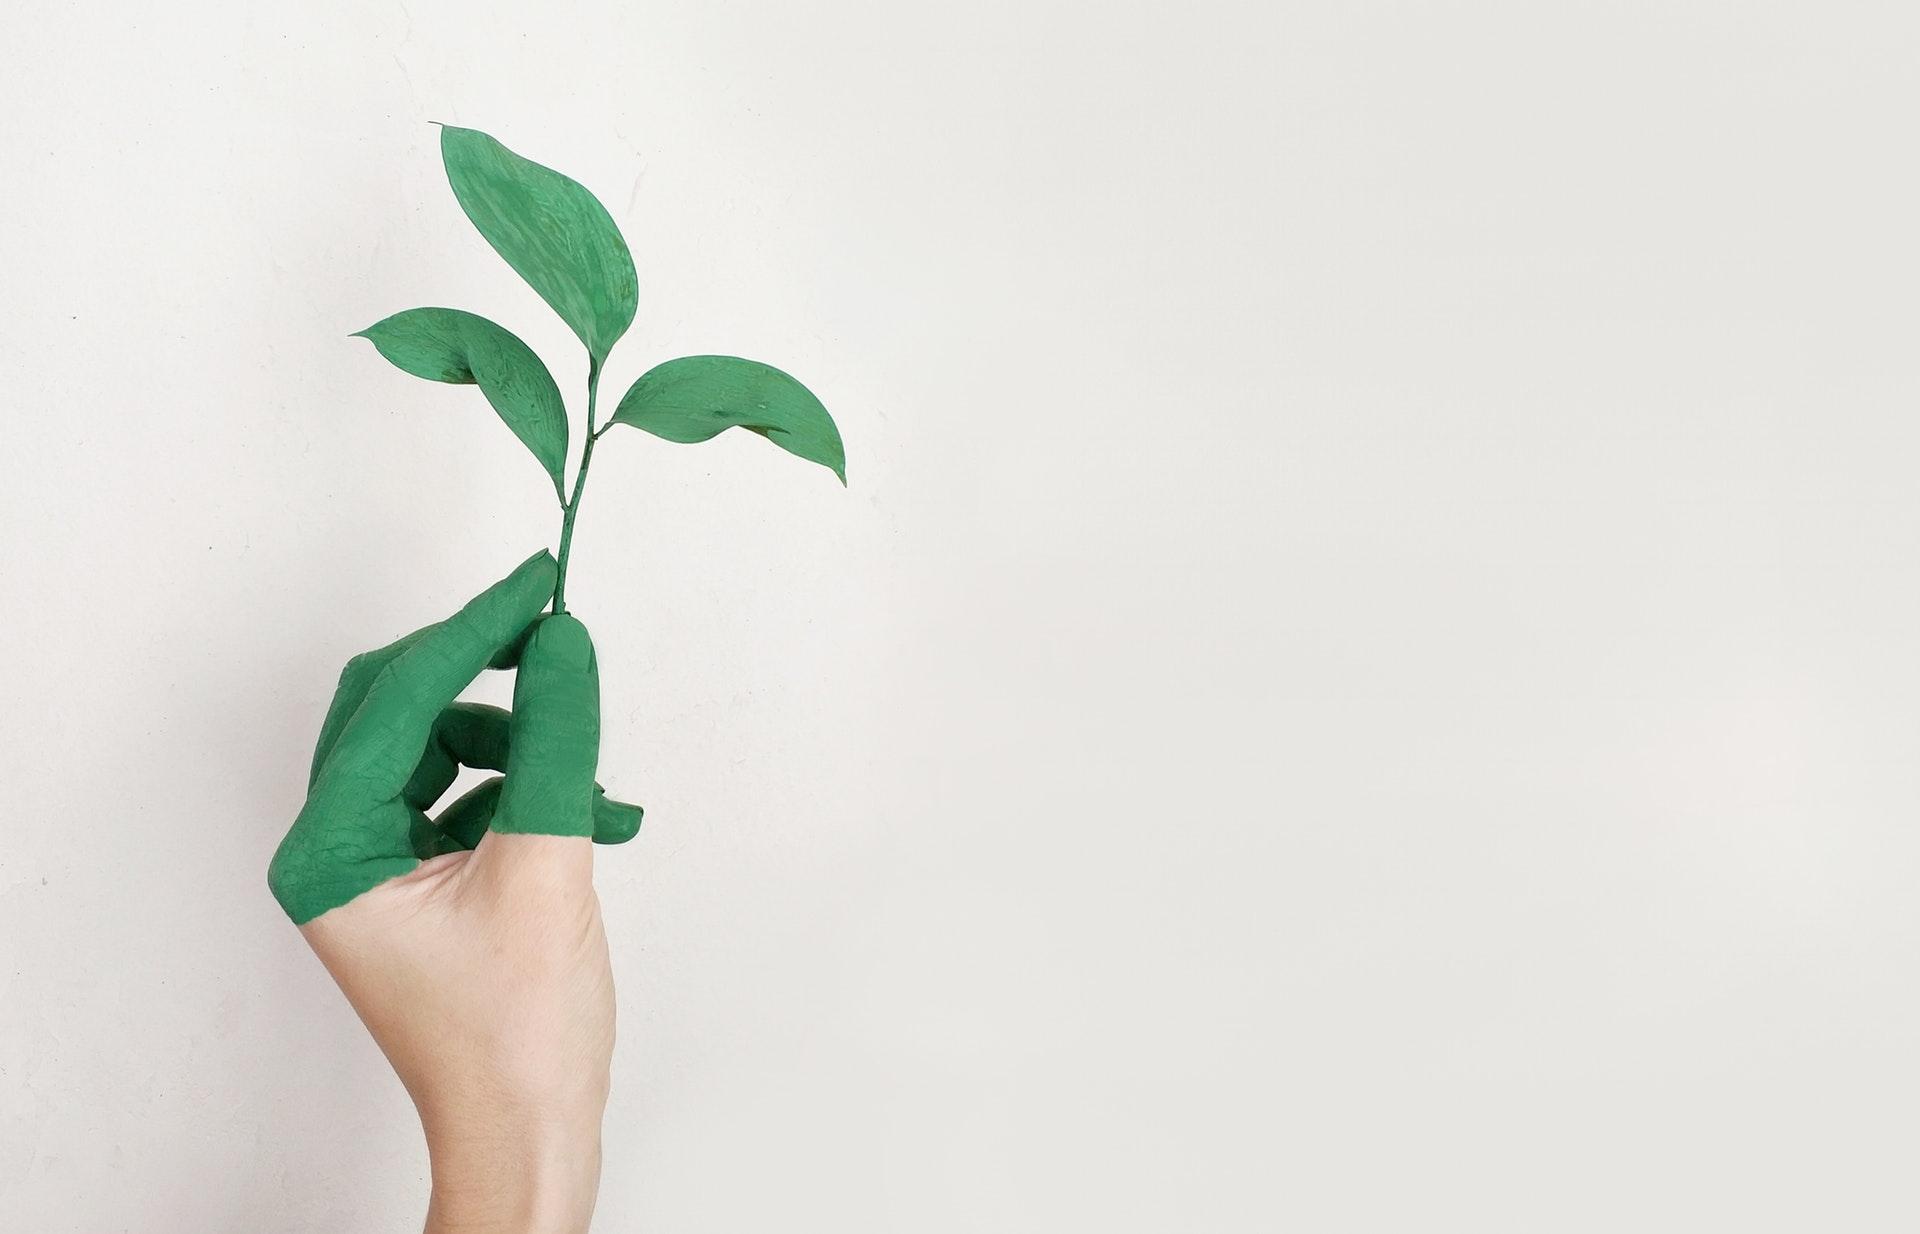 sustentabilidade_2019_planta_interna